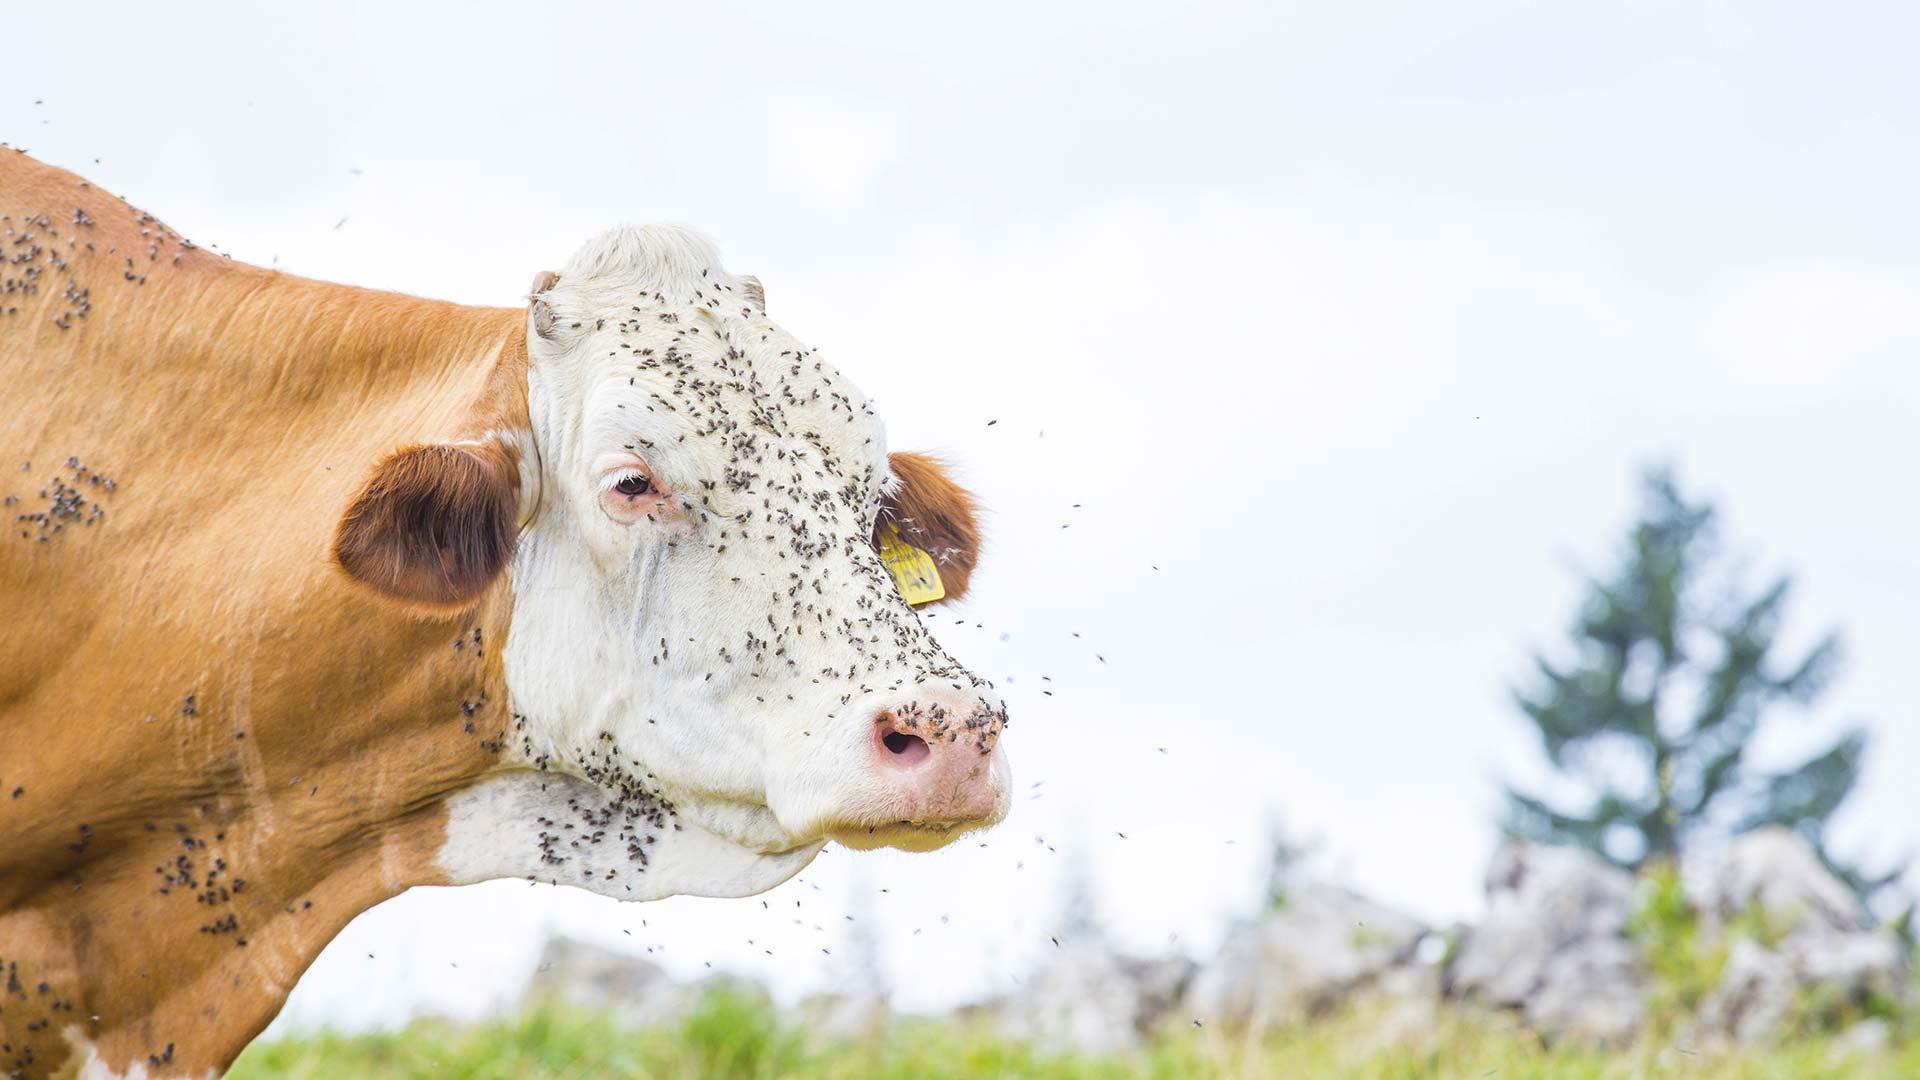 Kuh fliegt unter